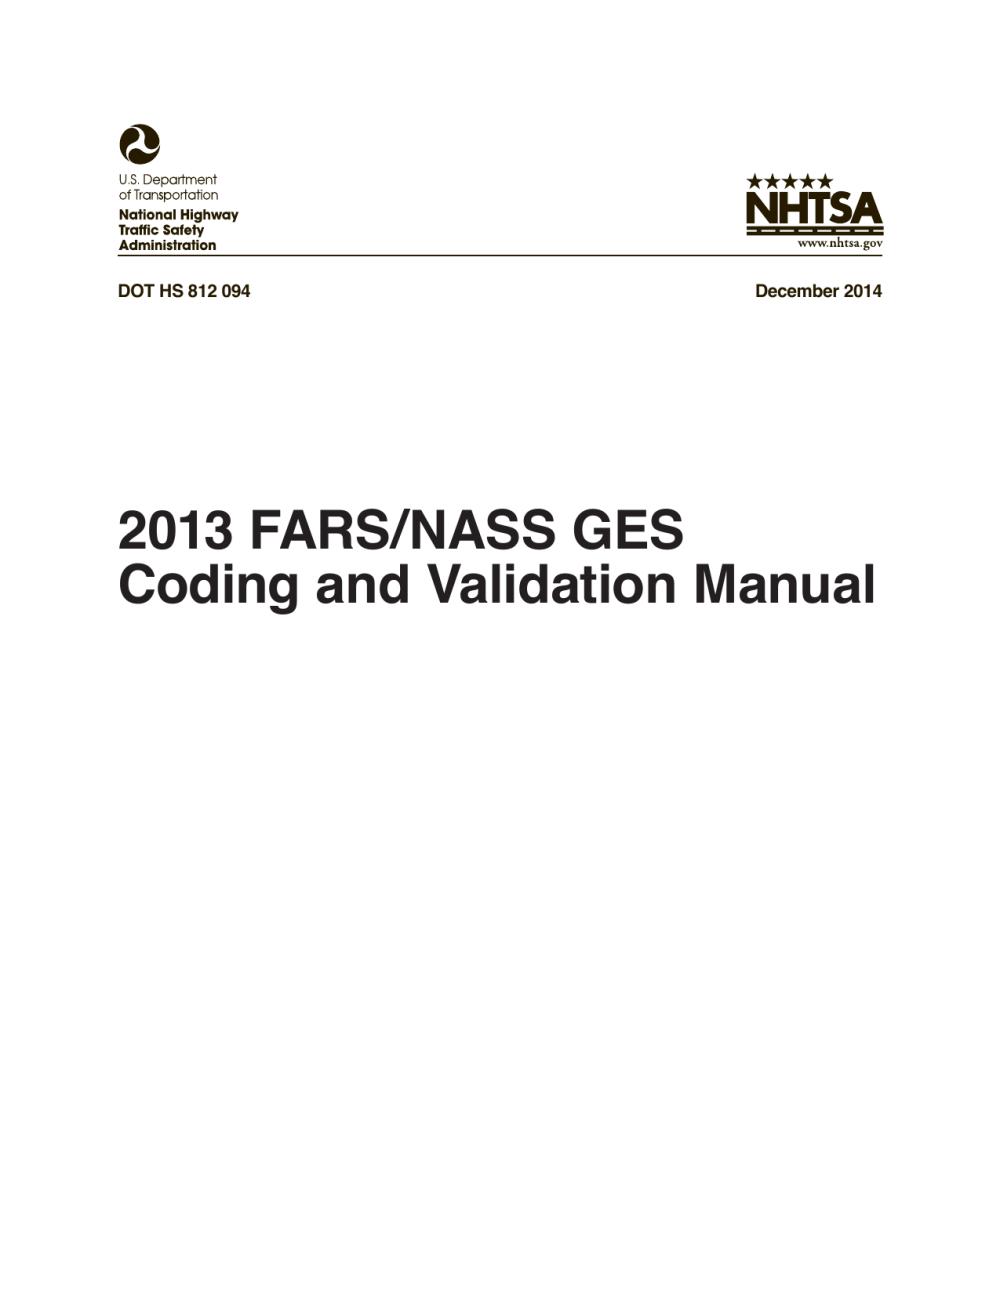 medium resolution of 2013 fars nass ges coding and validation manual